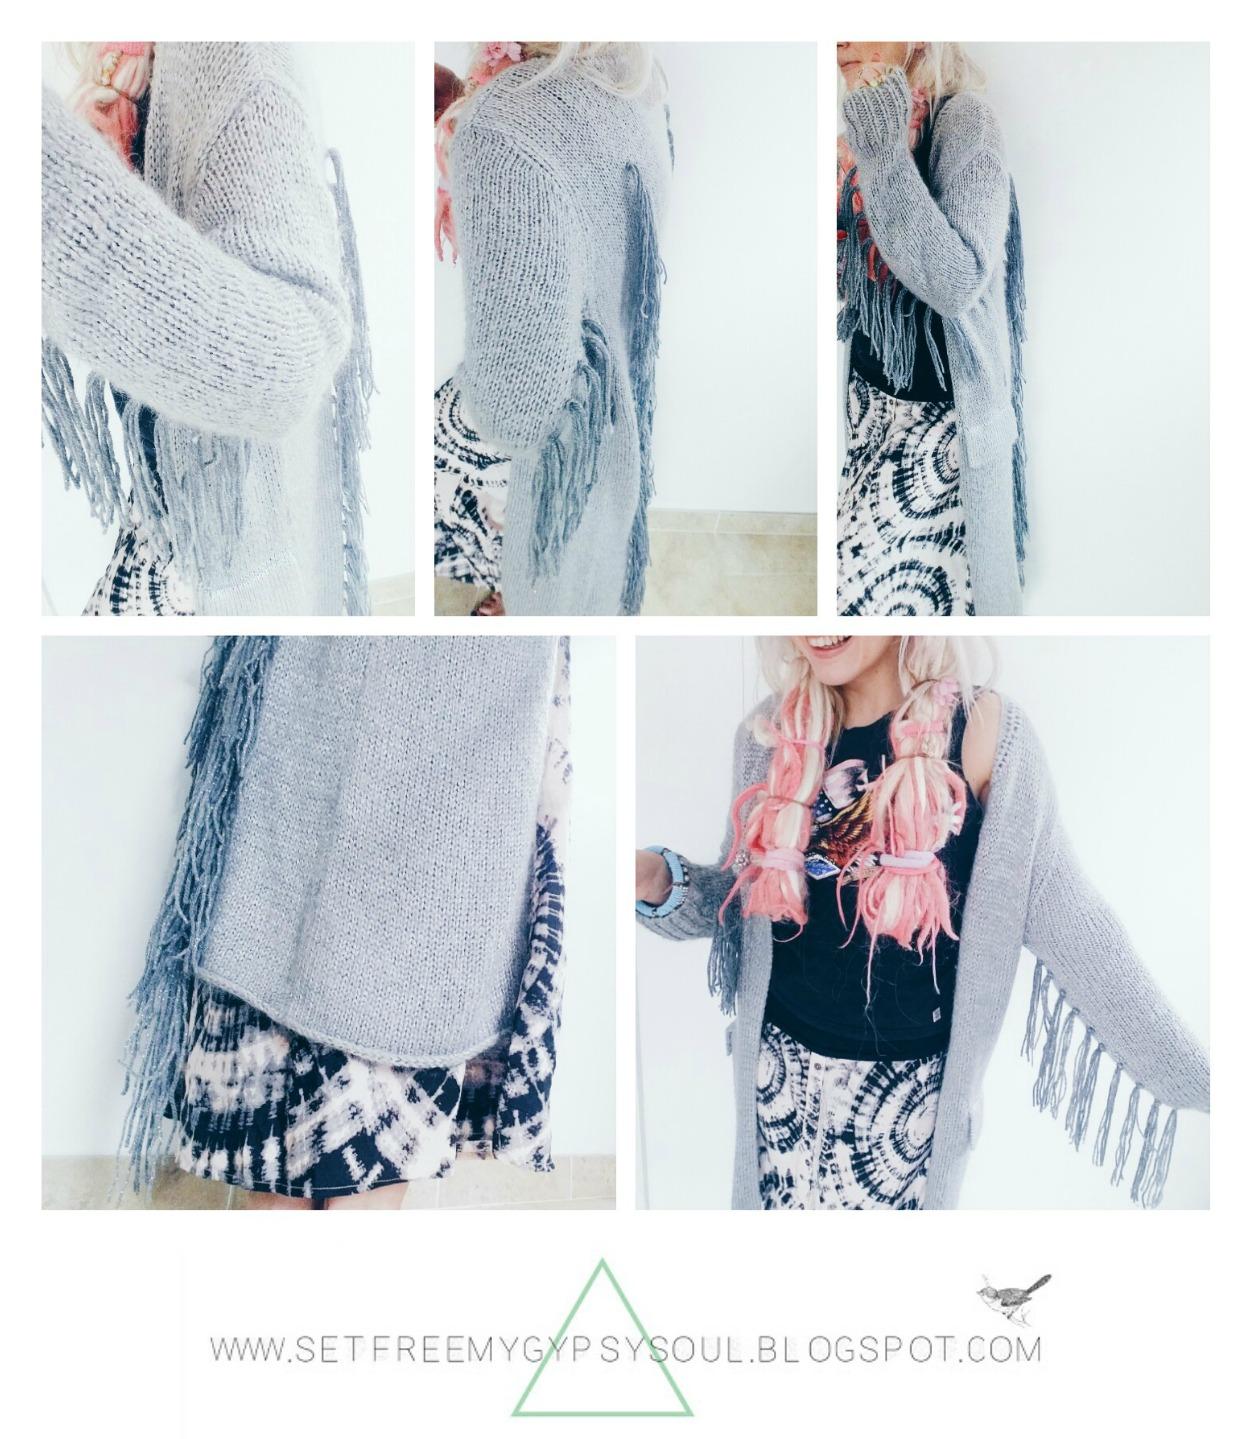 bohemian fashion boho chic upcycled refashion diy hack